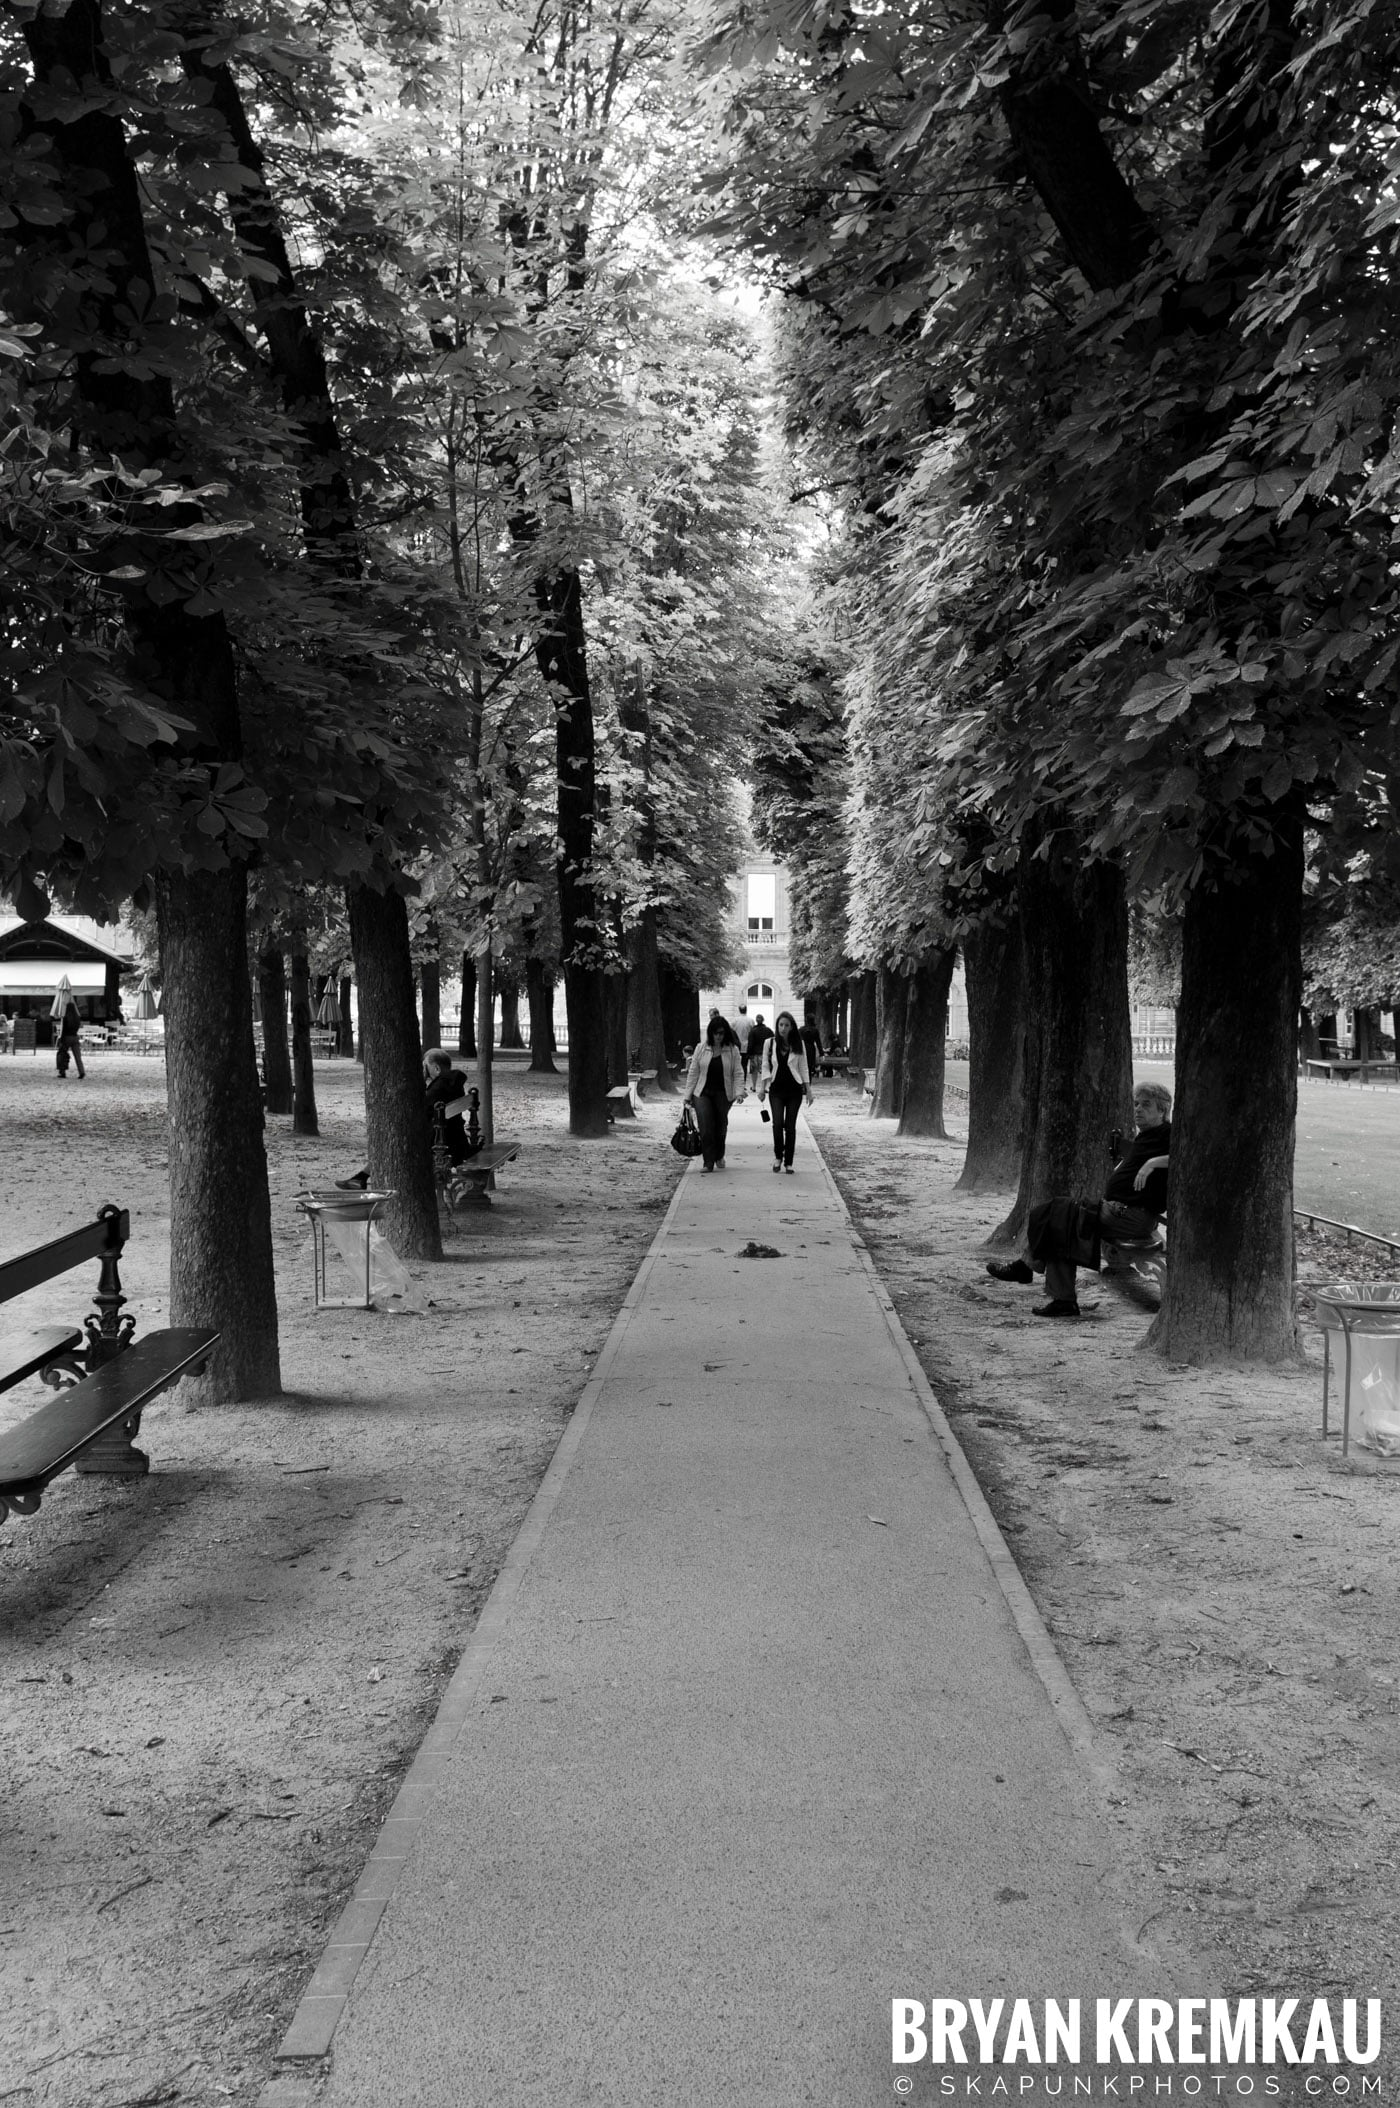 Paris, France Honeymoon - Day 1 - 7.18.11 (52)